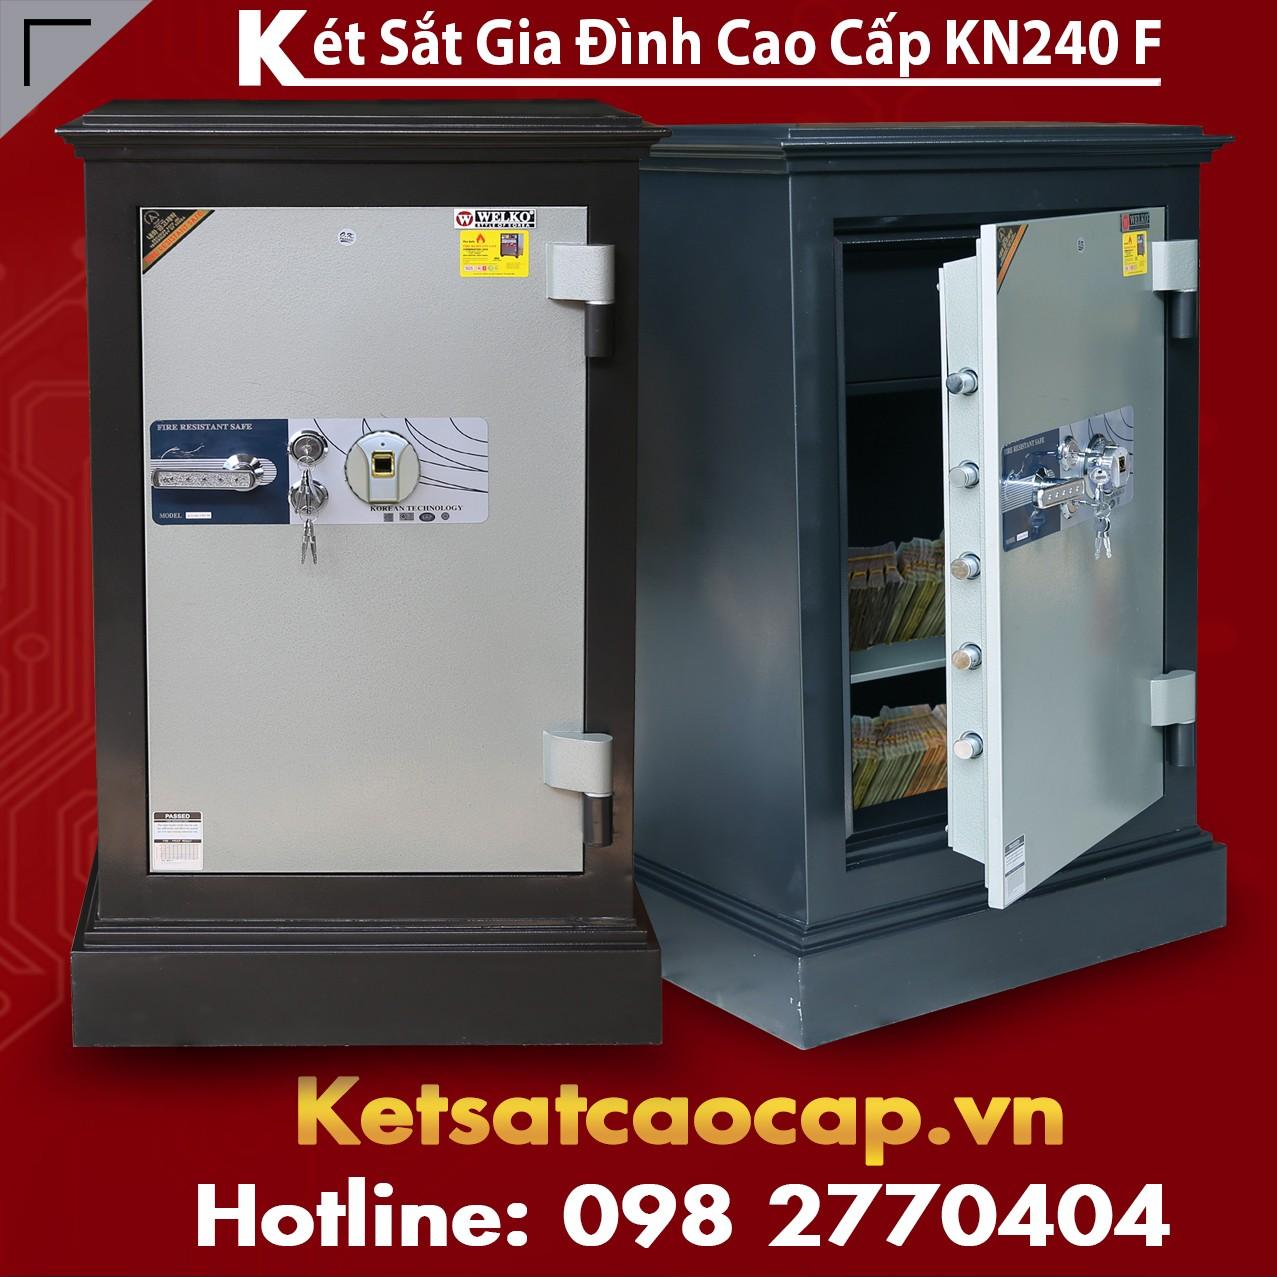 tư vấn mua két sắt gia đình - két sắt Fireproof Safes